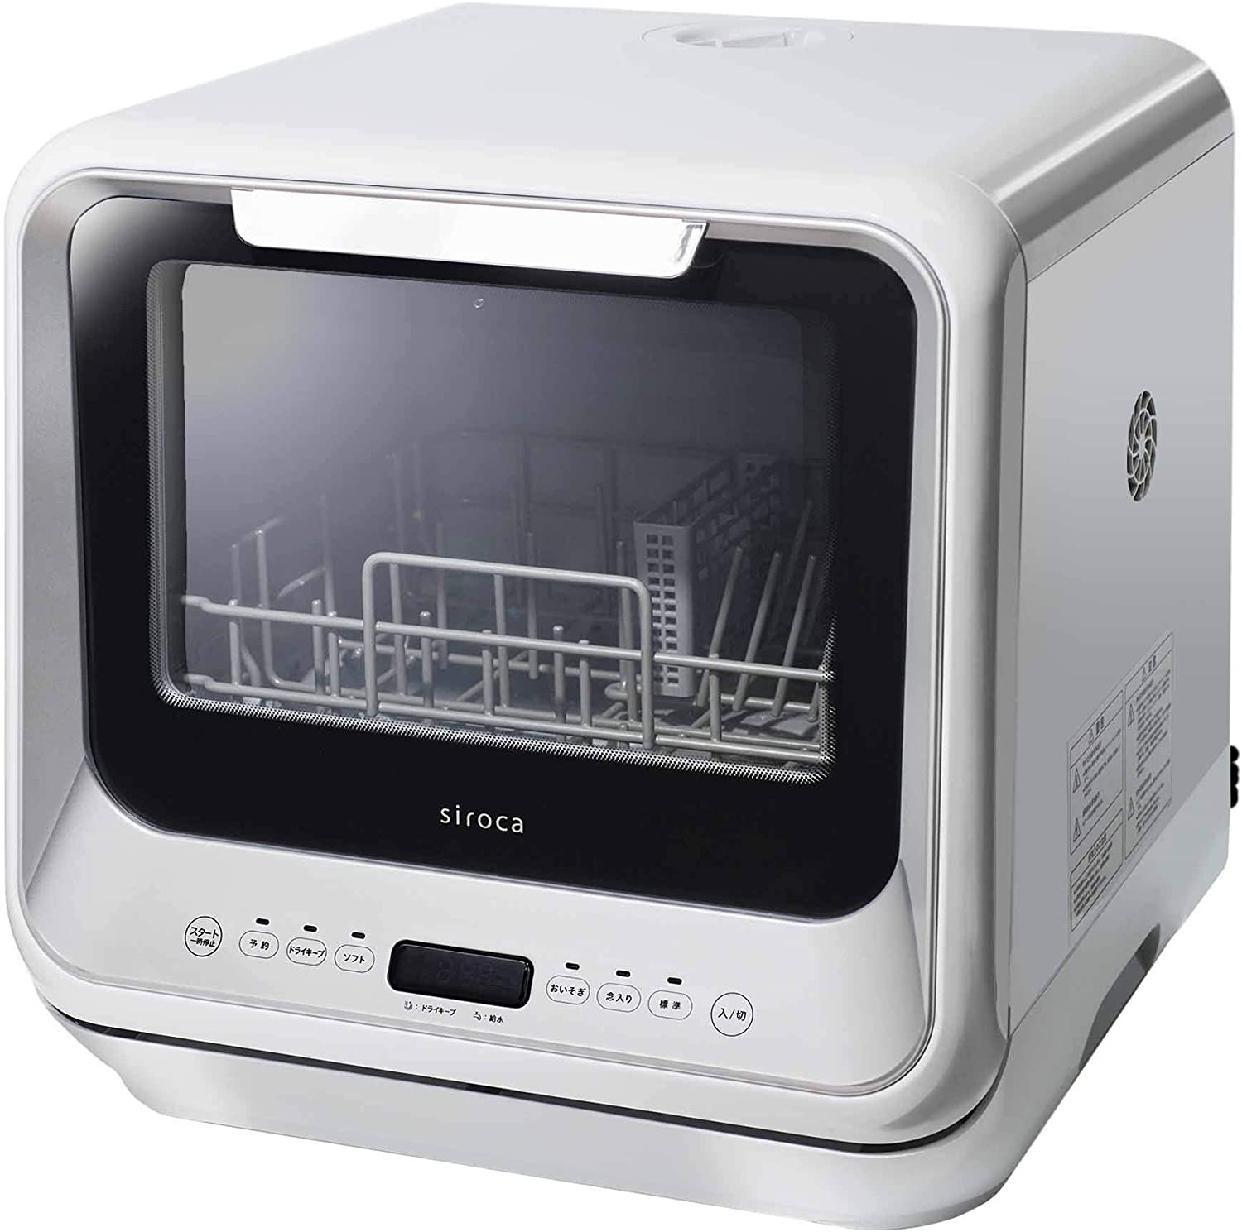 siroca(シロカ) 食器洗い乾燥機 SS-M151の商品画像